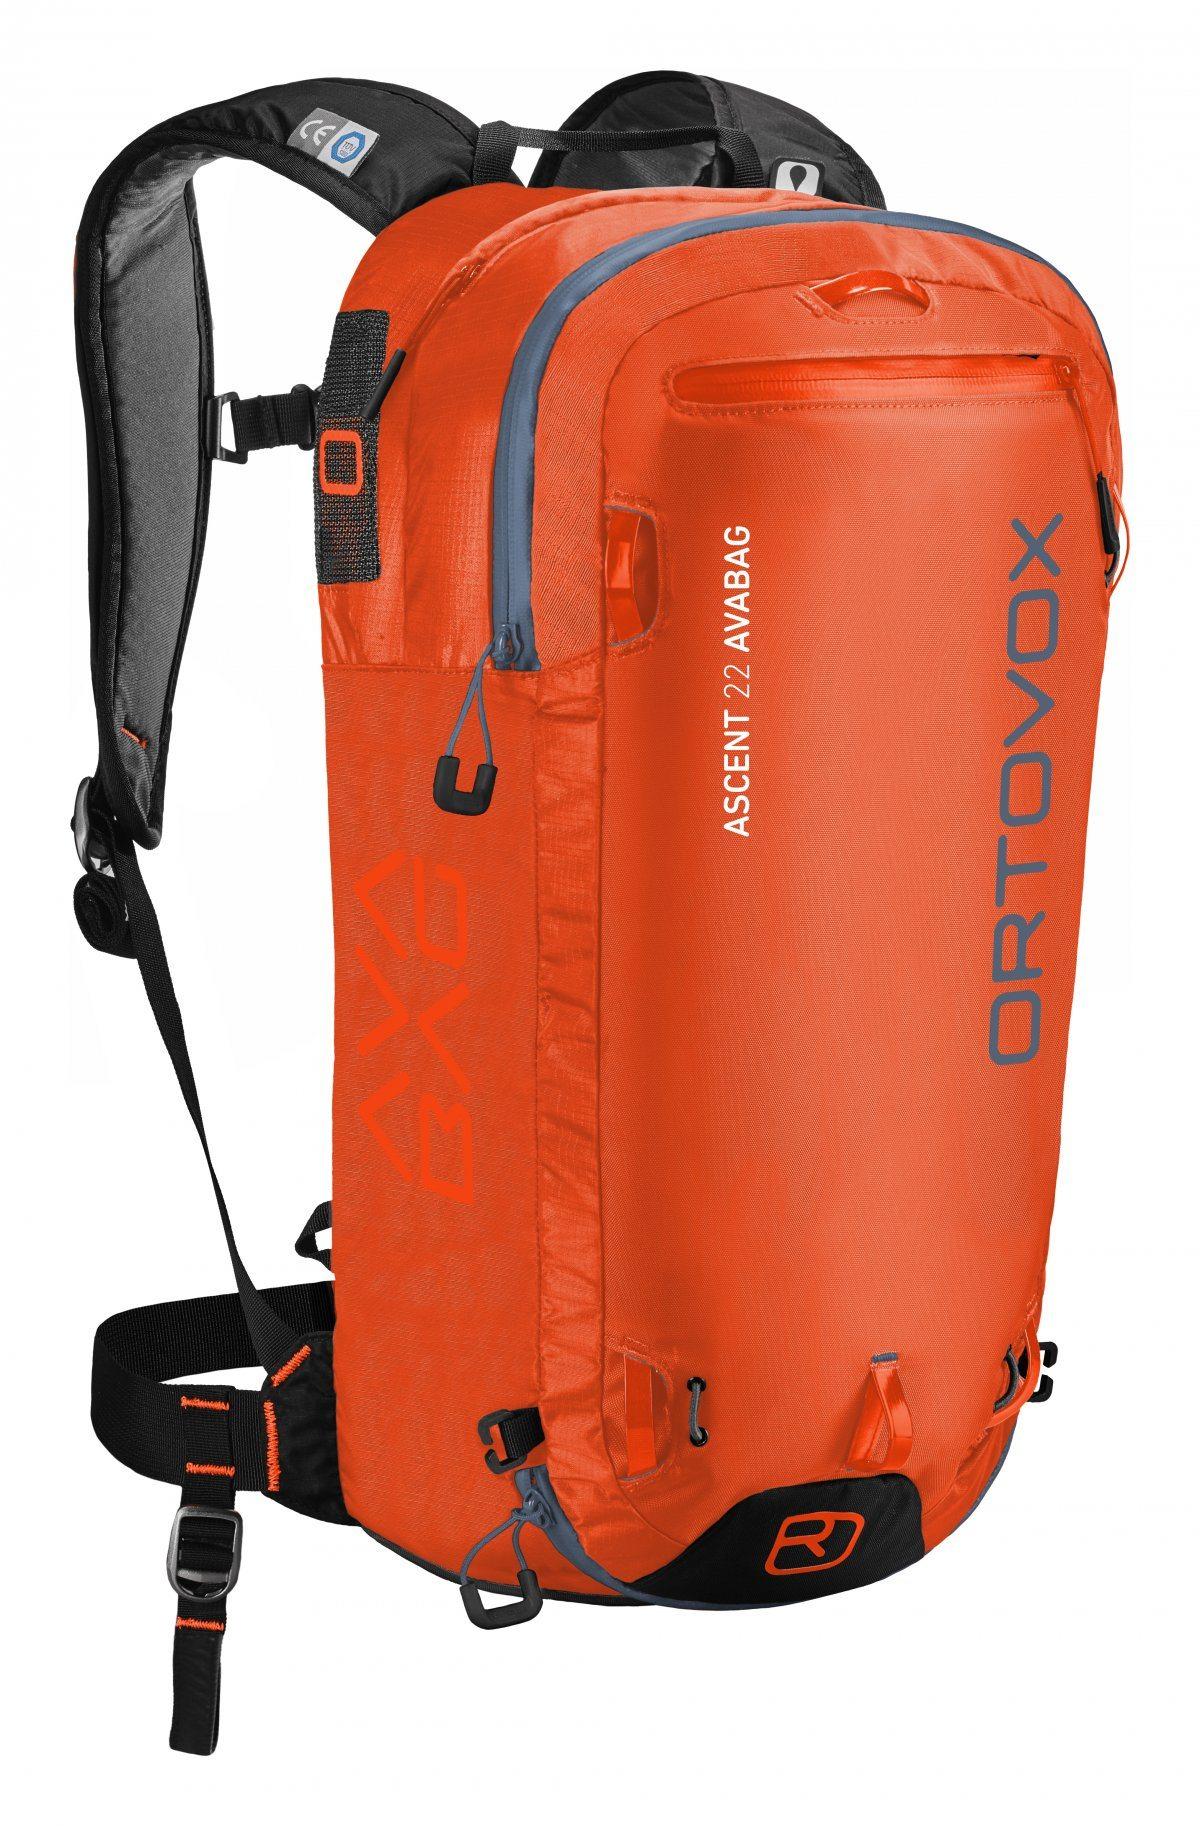 Ortovox Ascent 22 Avabag - Crazy Orange - Front View